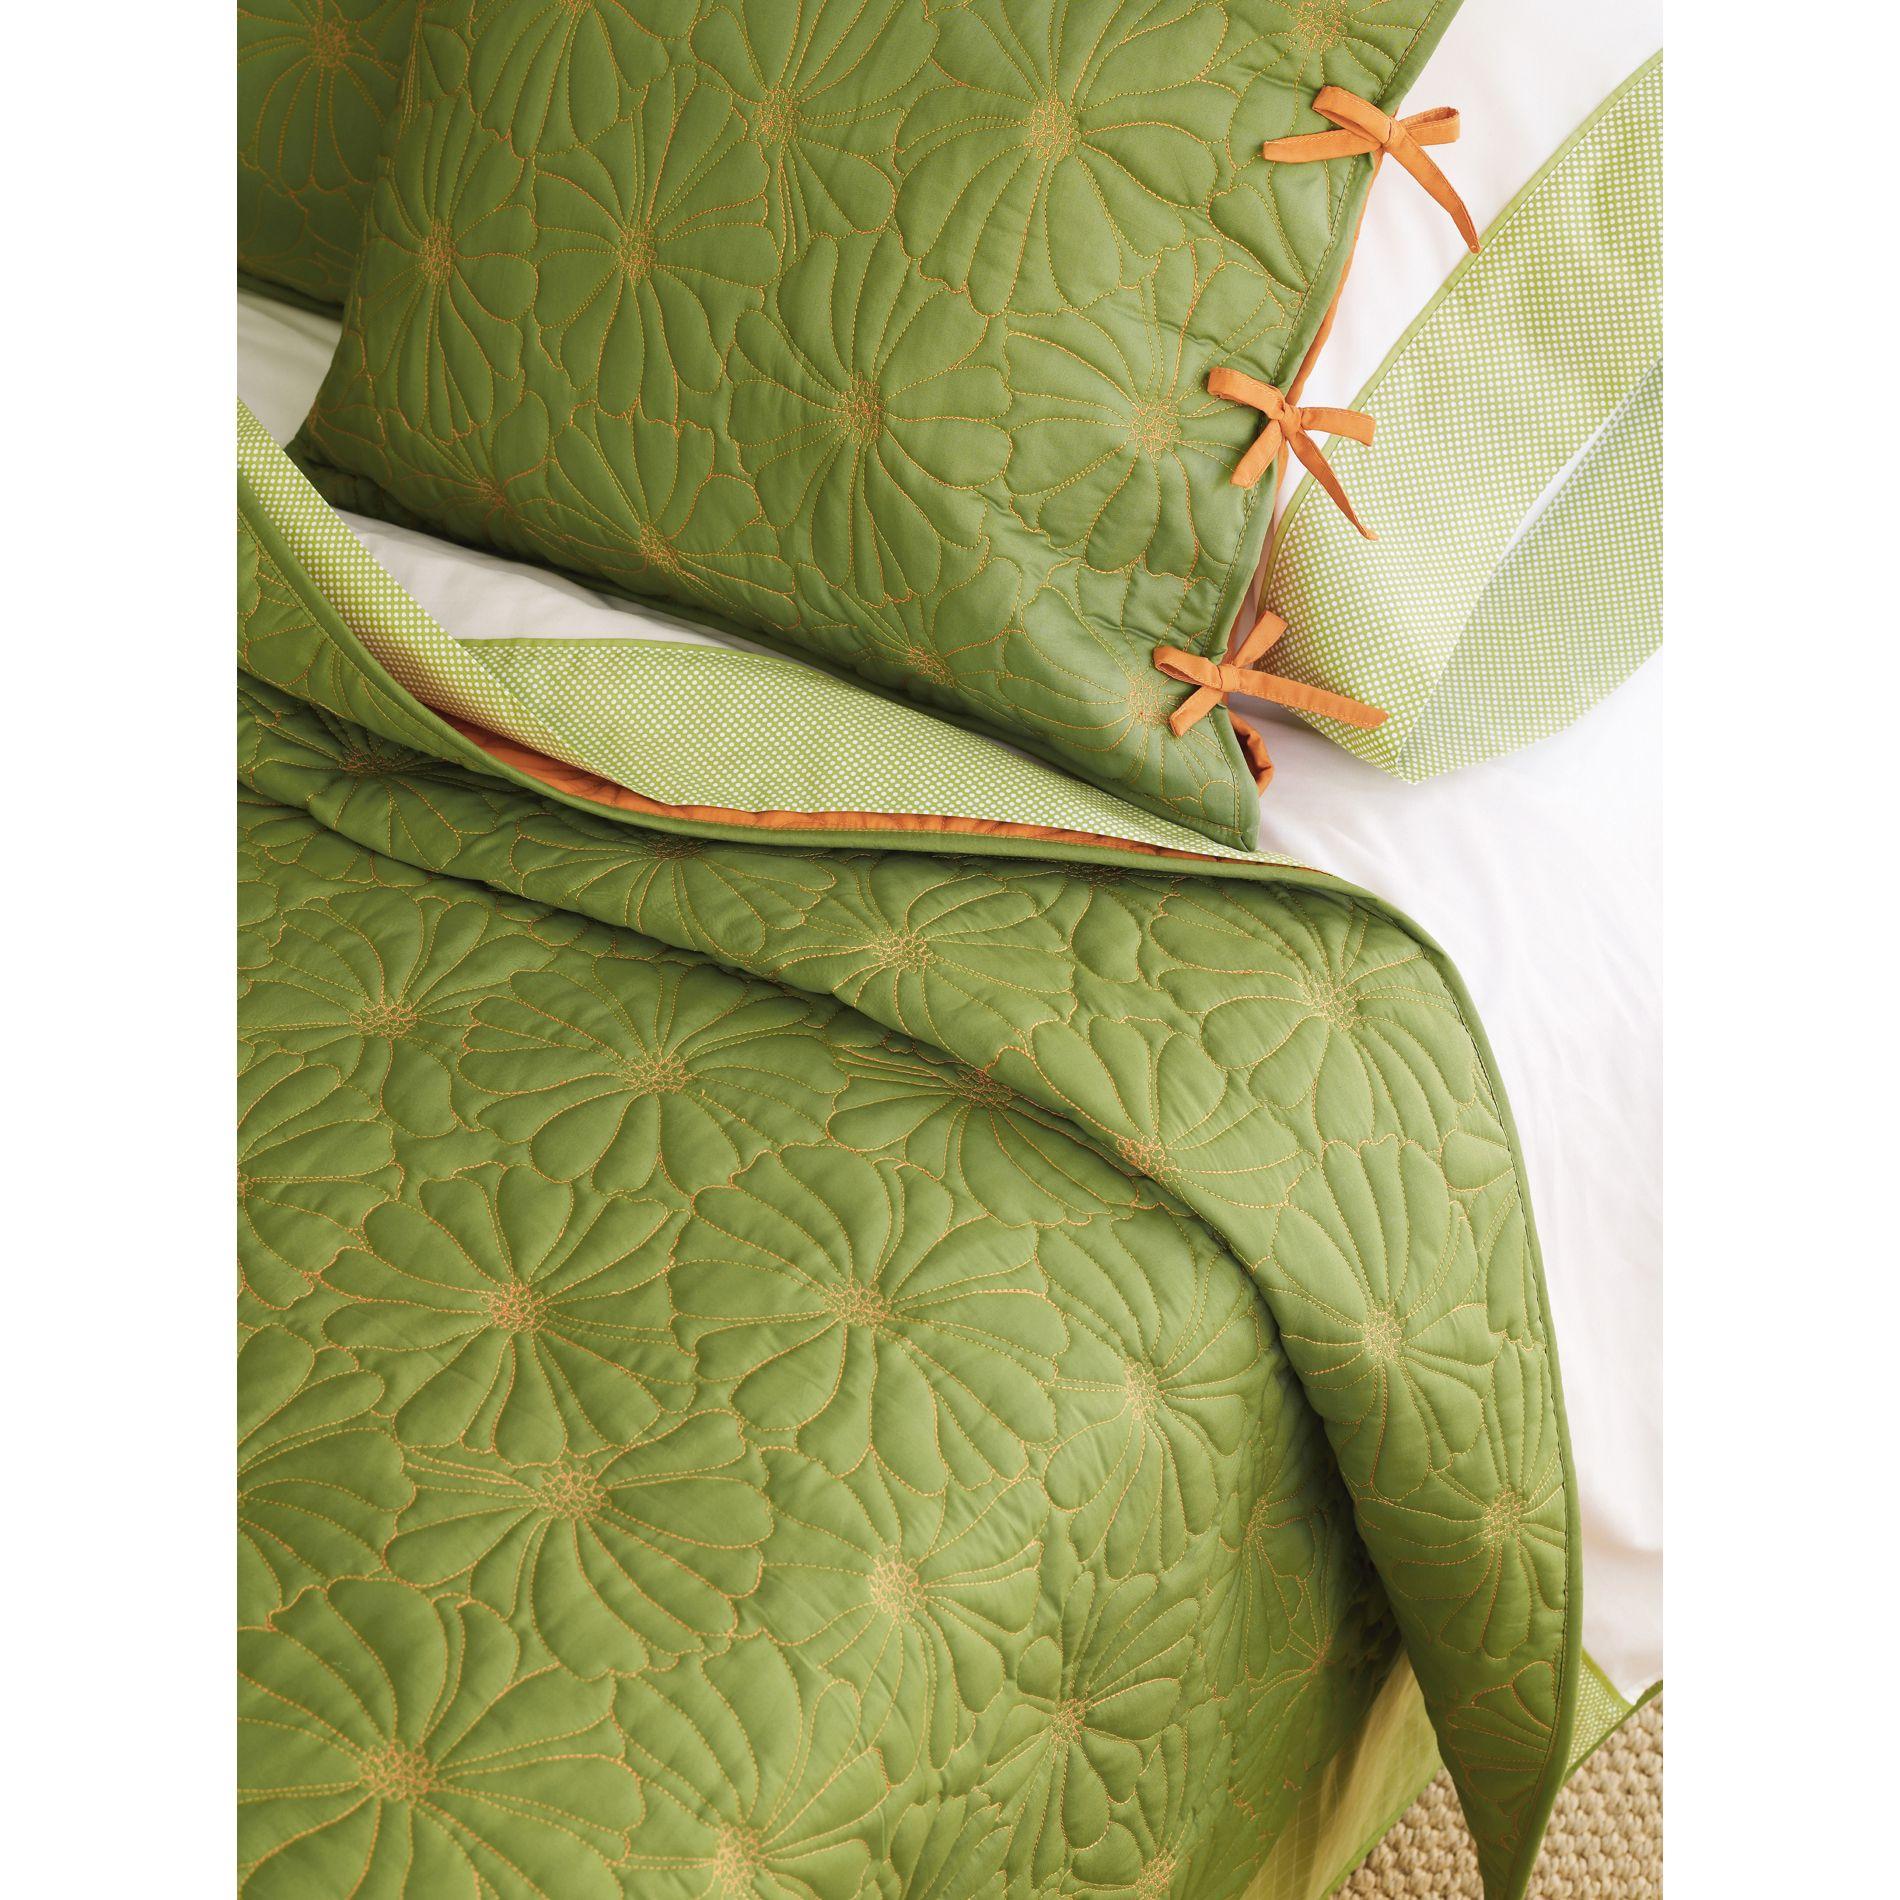 Springmaid Reversible Aris Spring Green & Apricot Coverlet